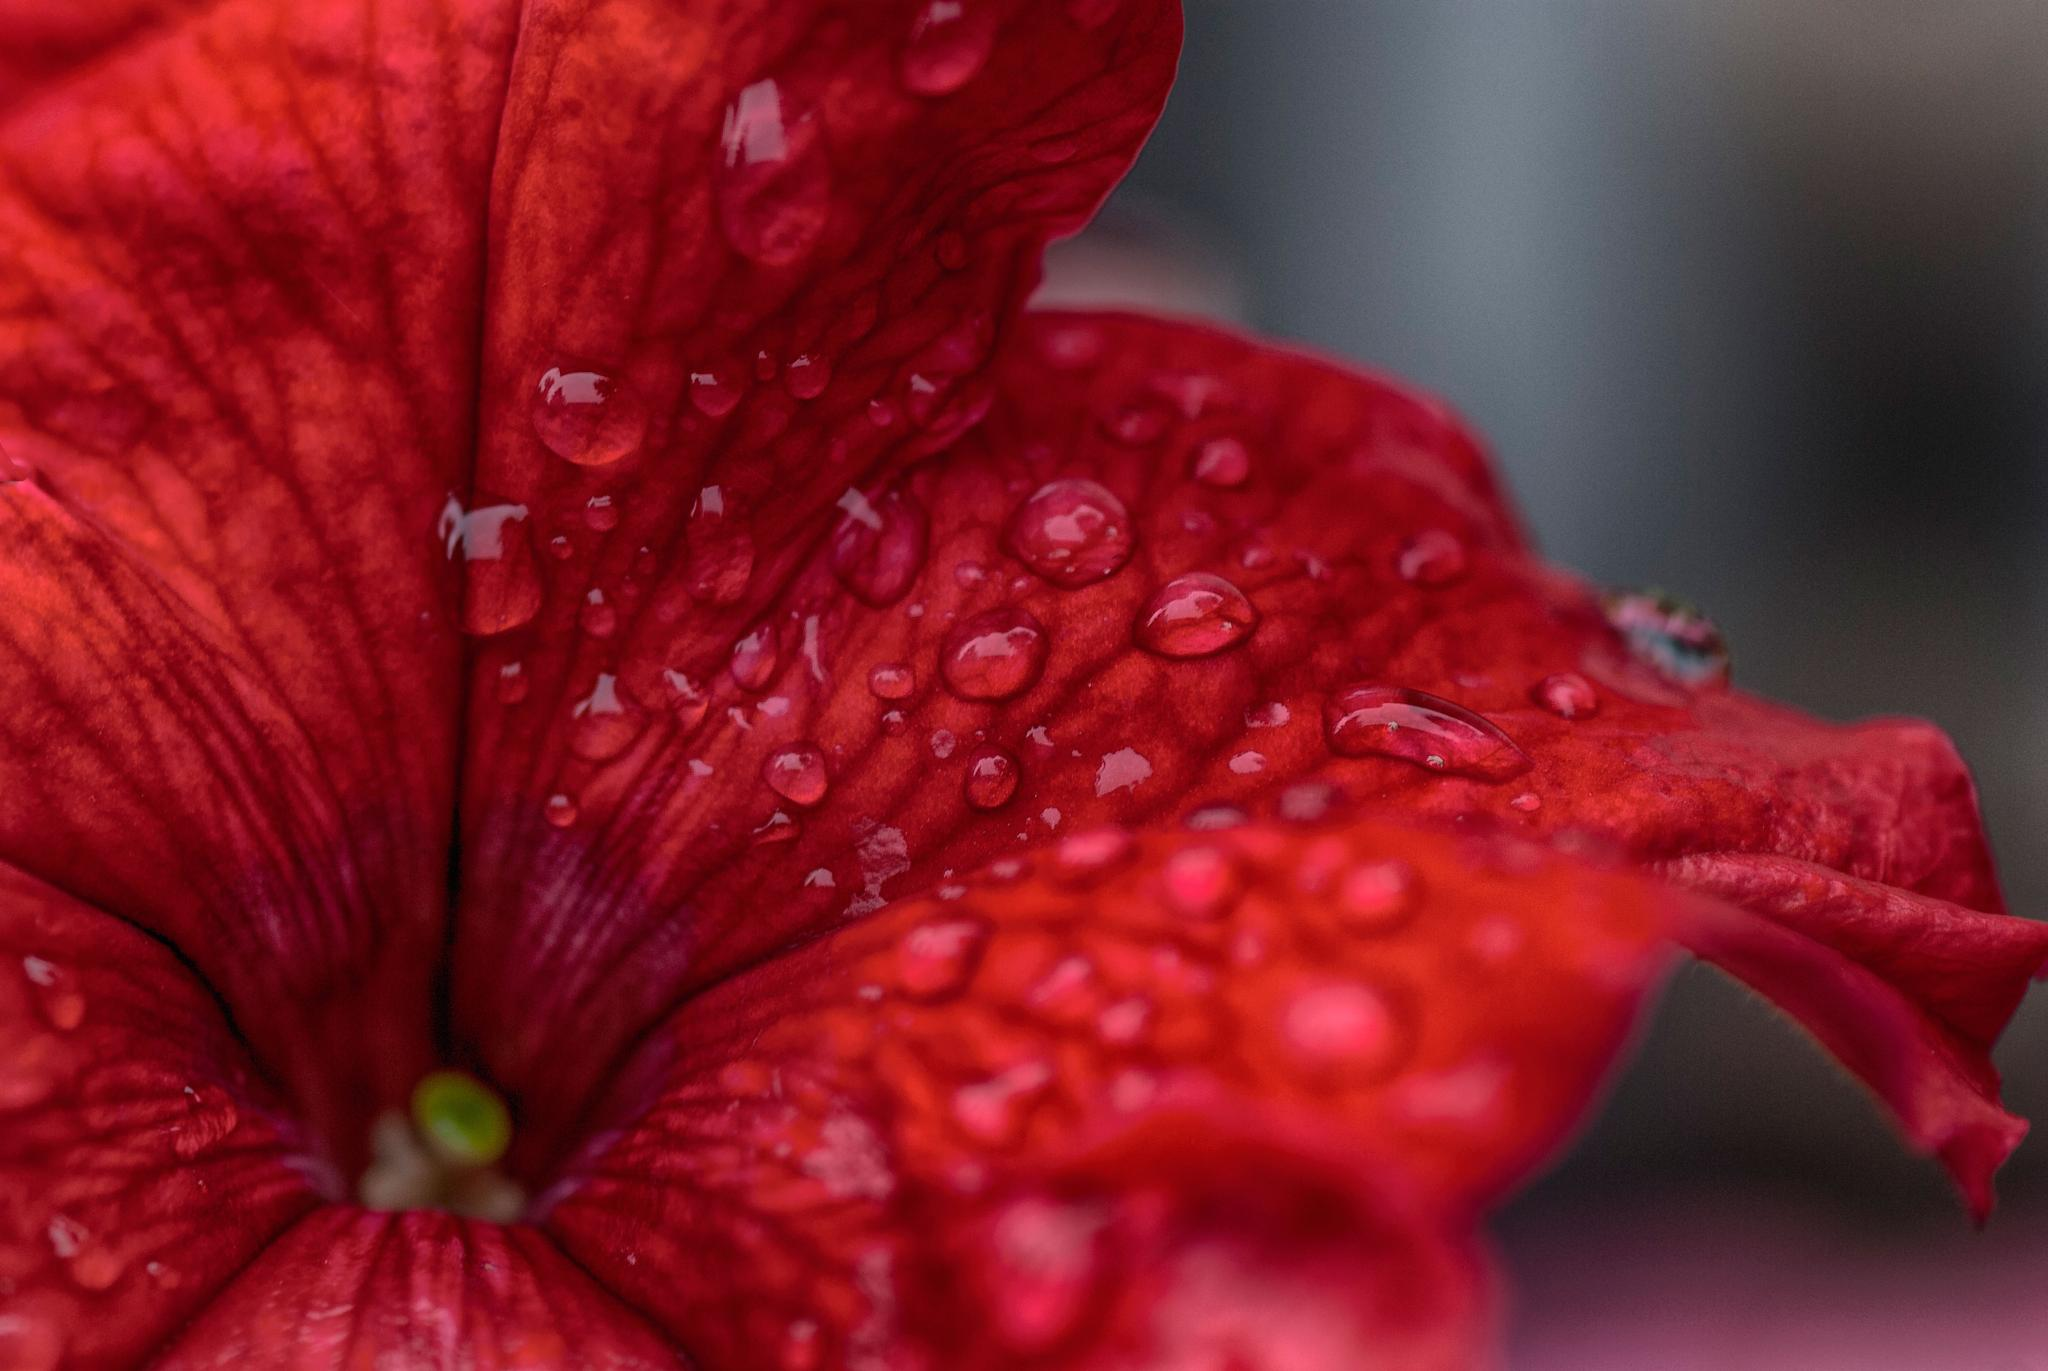 rainy#2 by beautiful flower.